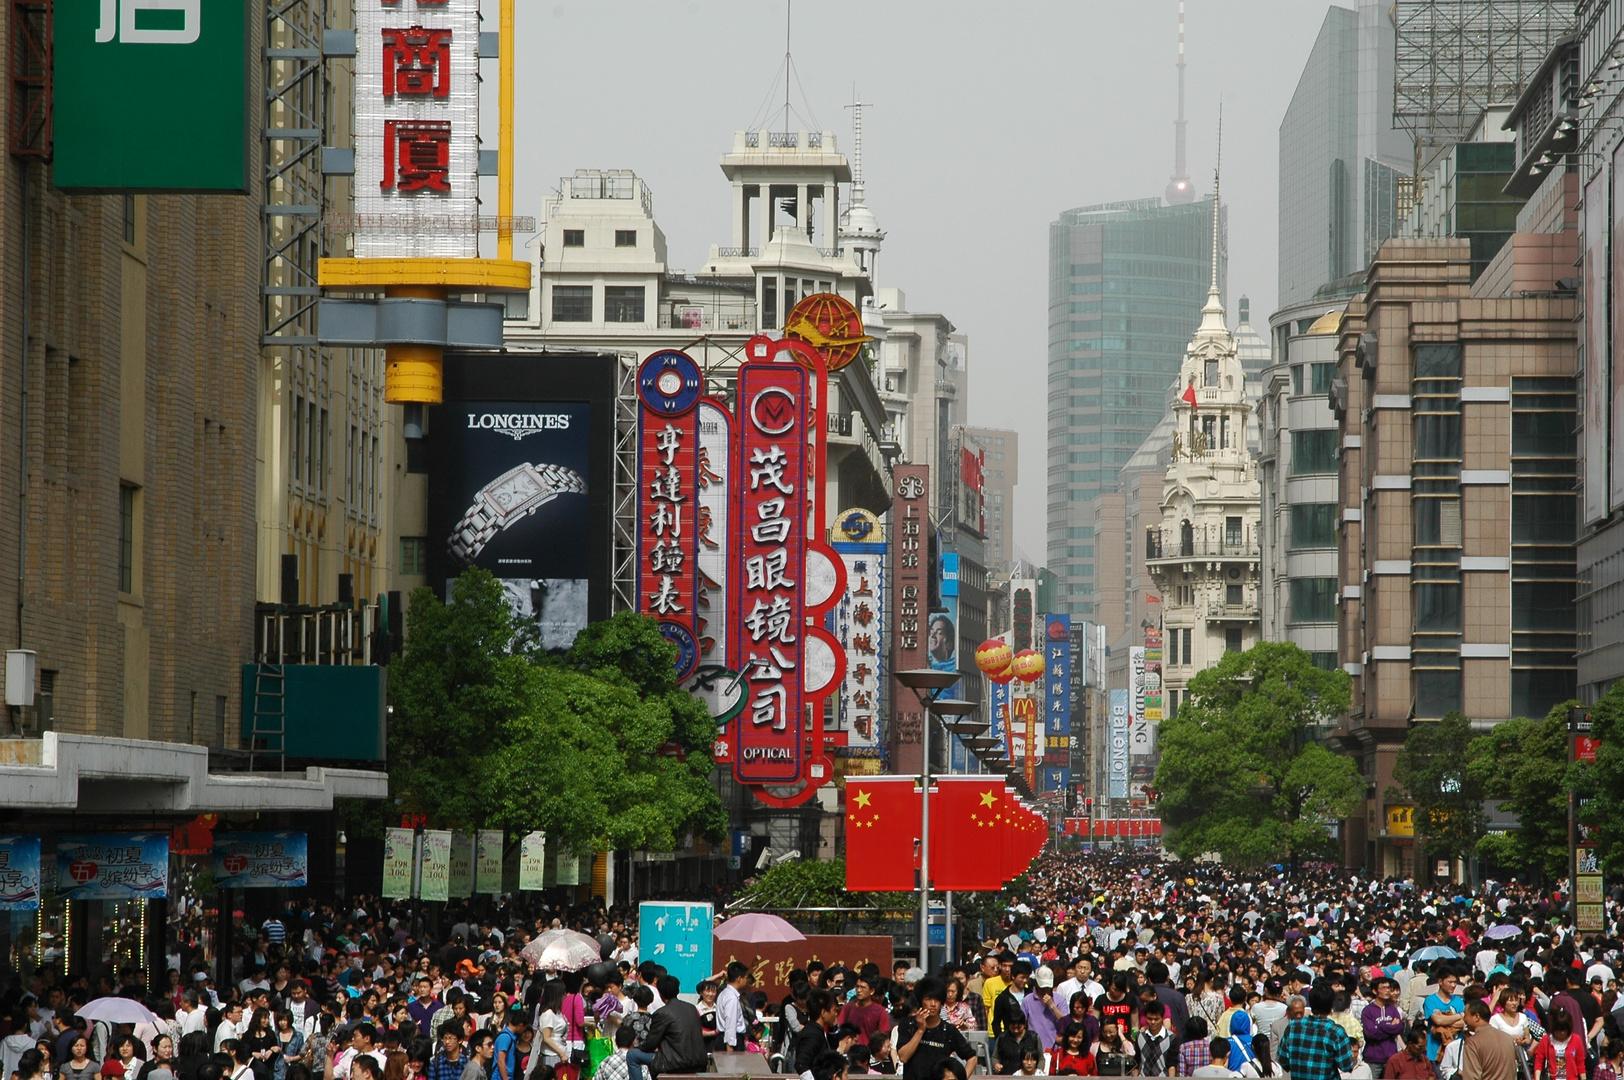 Fußgängerzone Shanghai